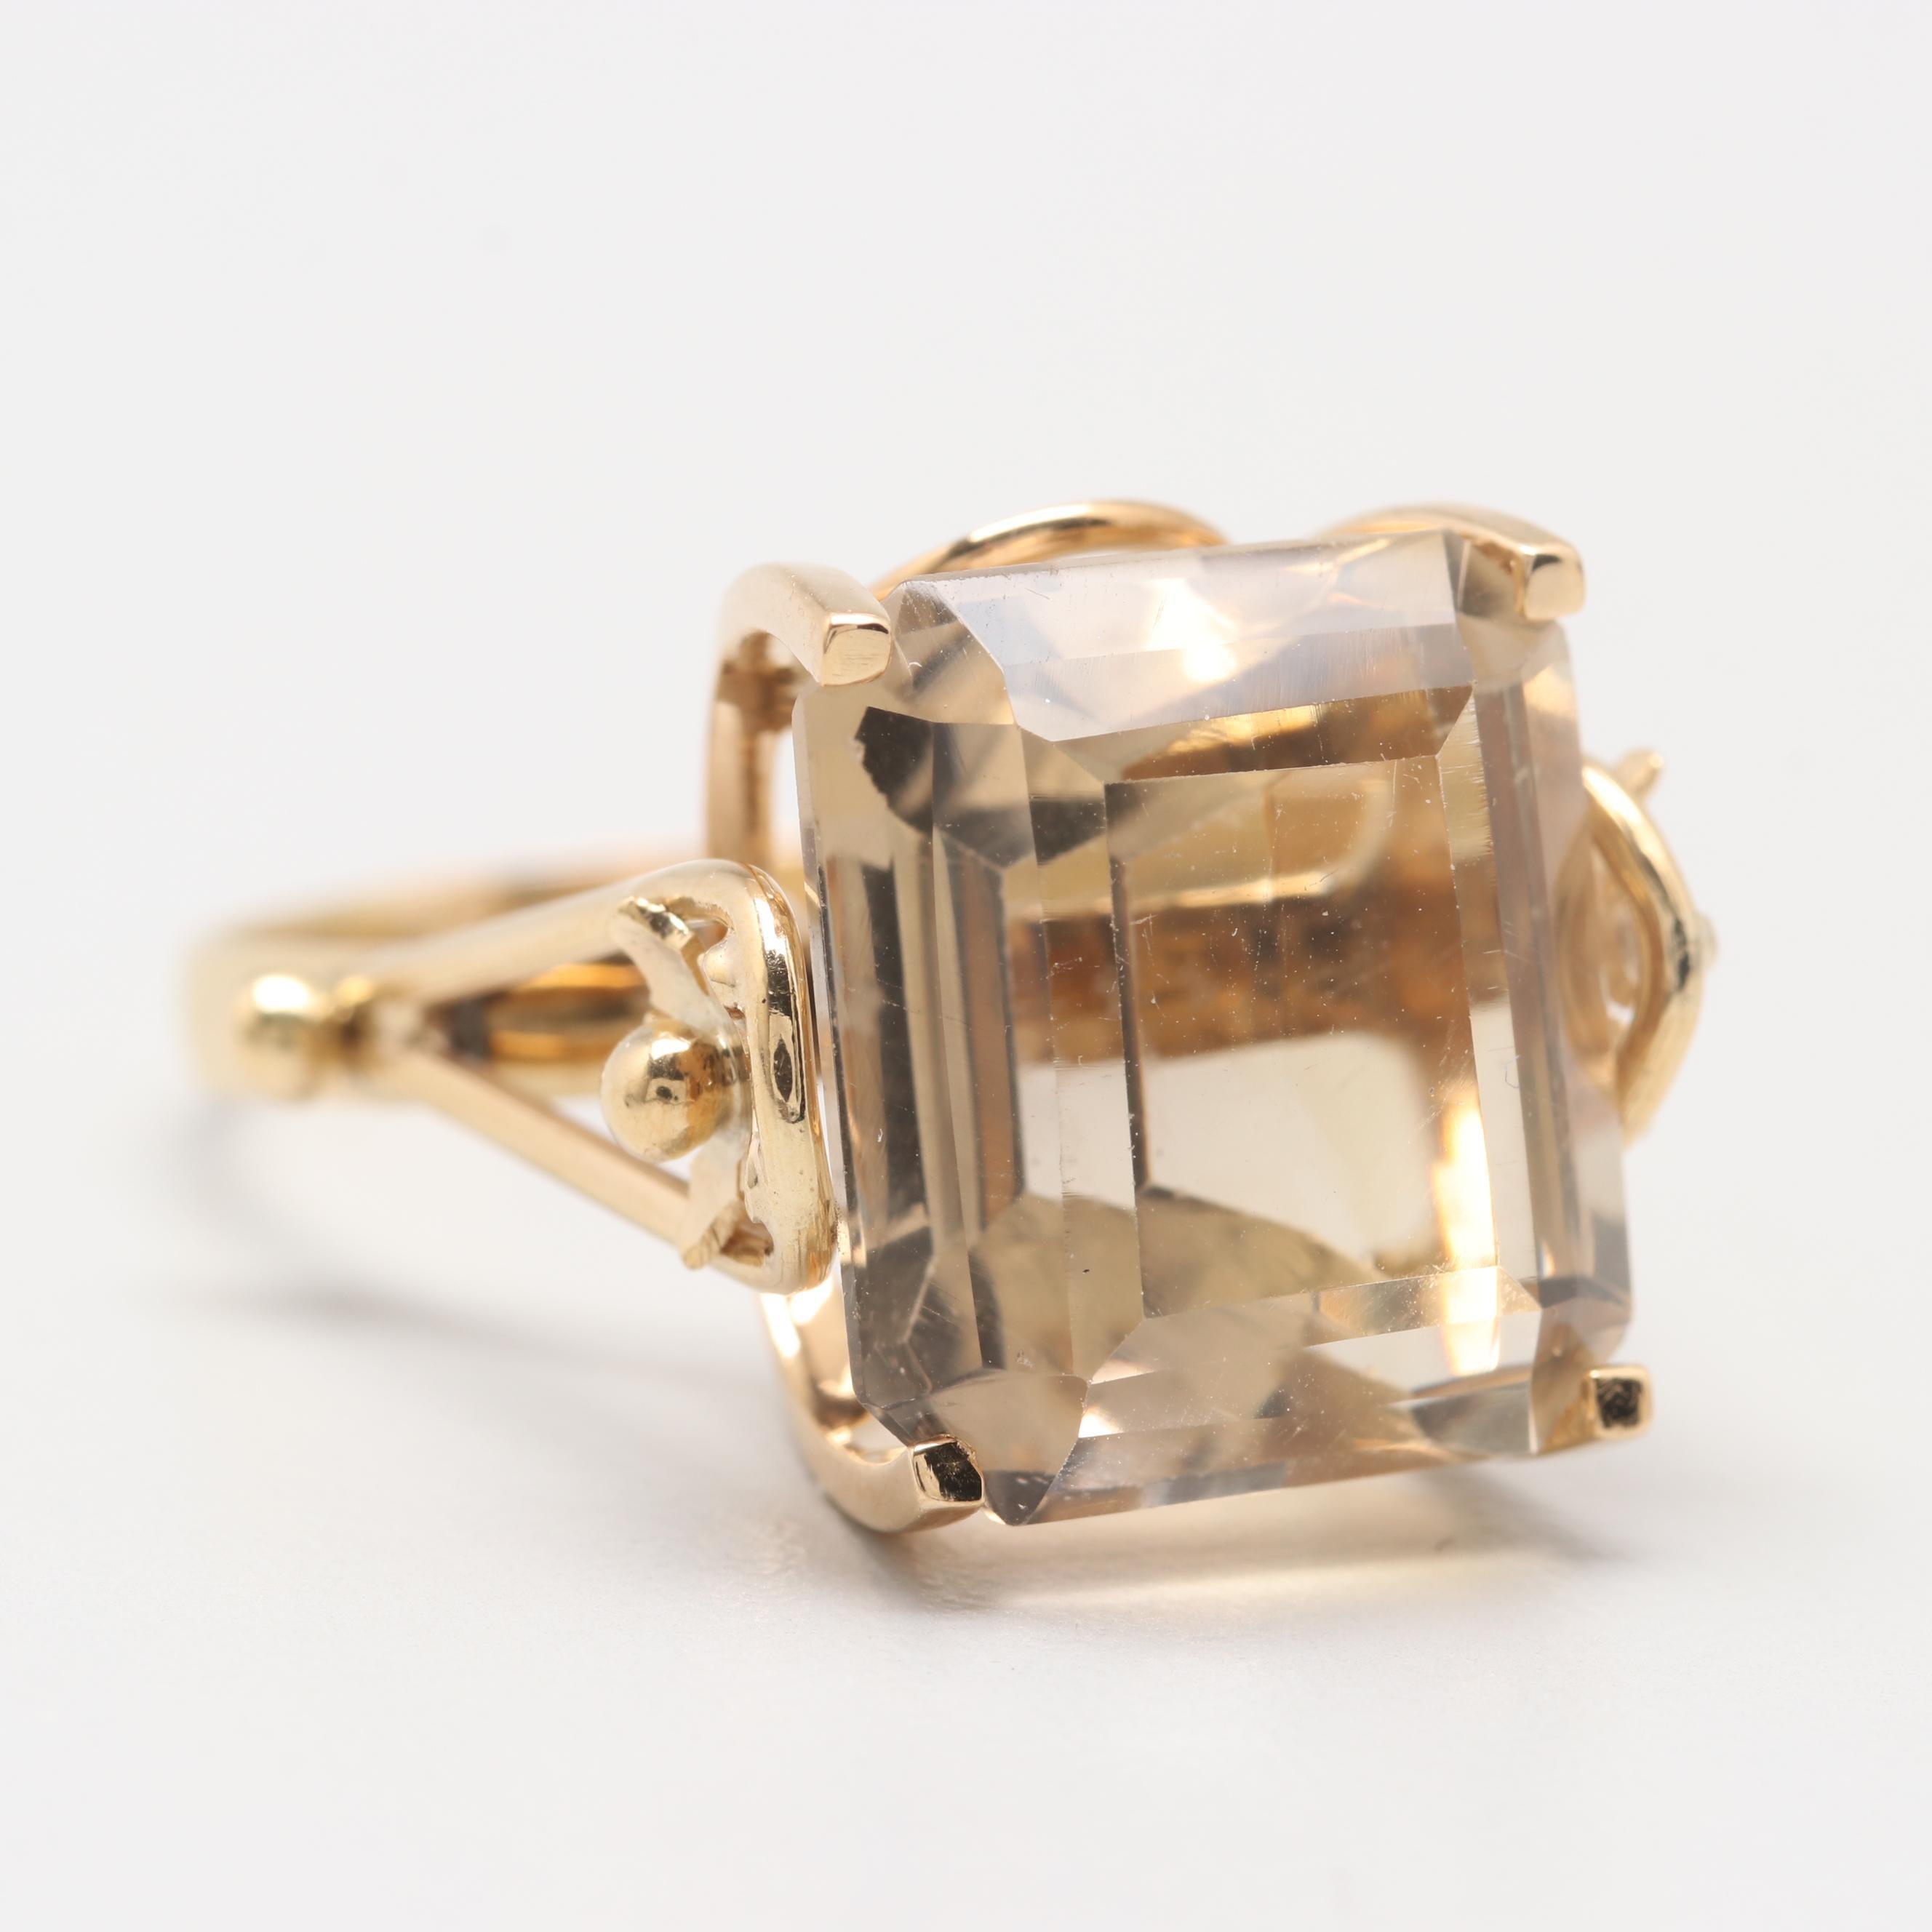 18K Yellow Gold 10.12 CT Citrine Ring